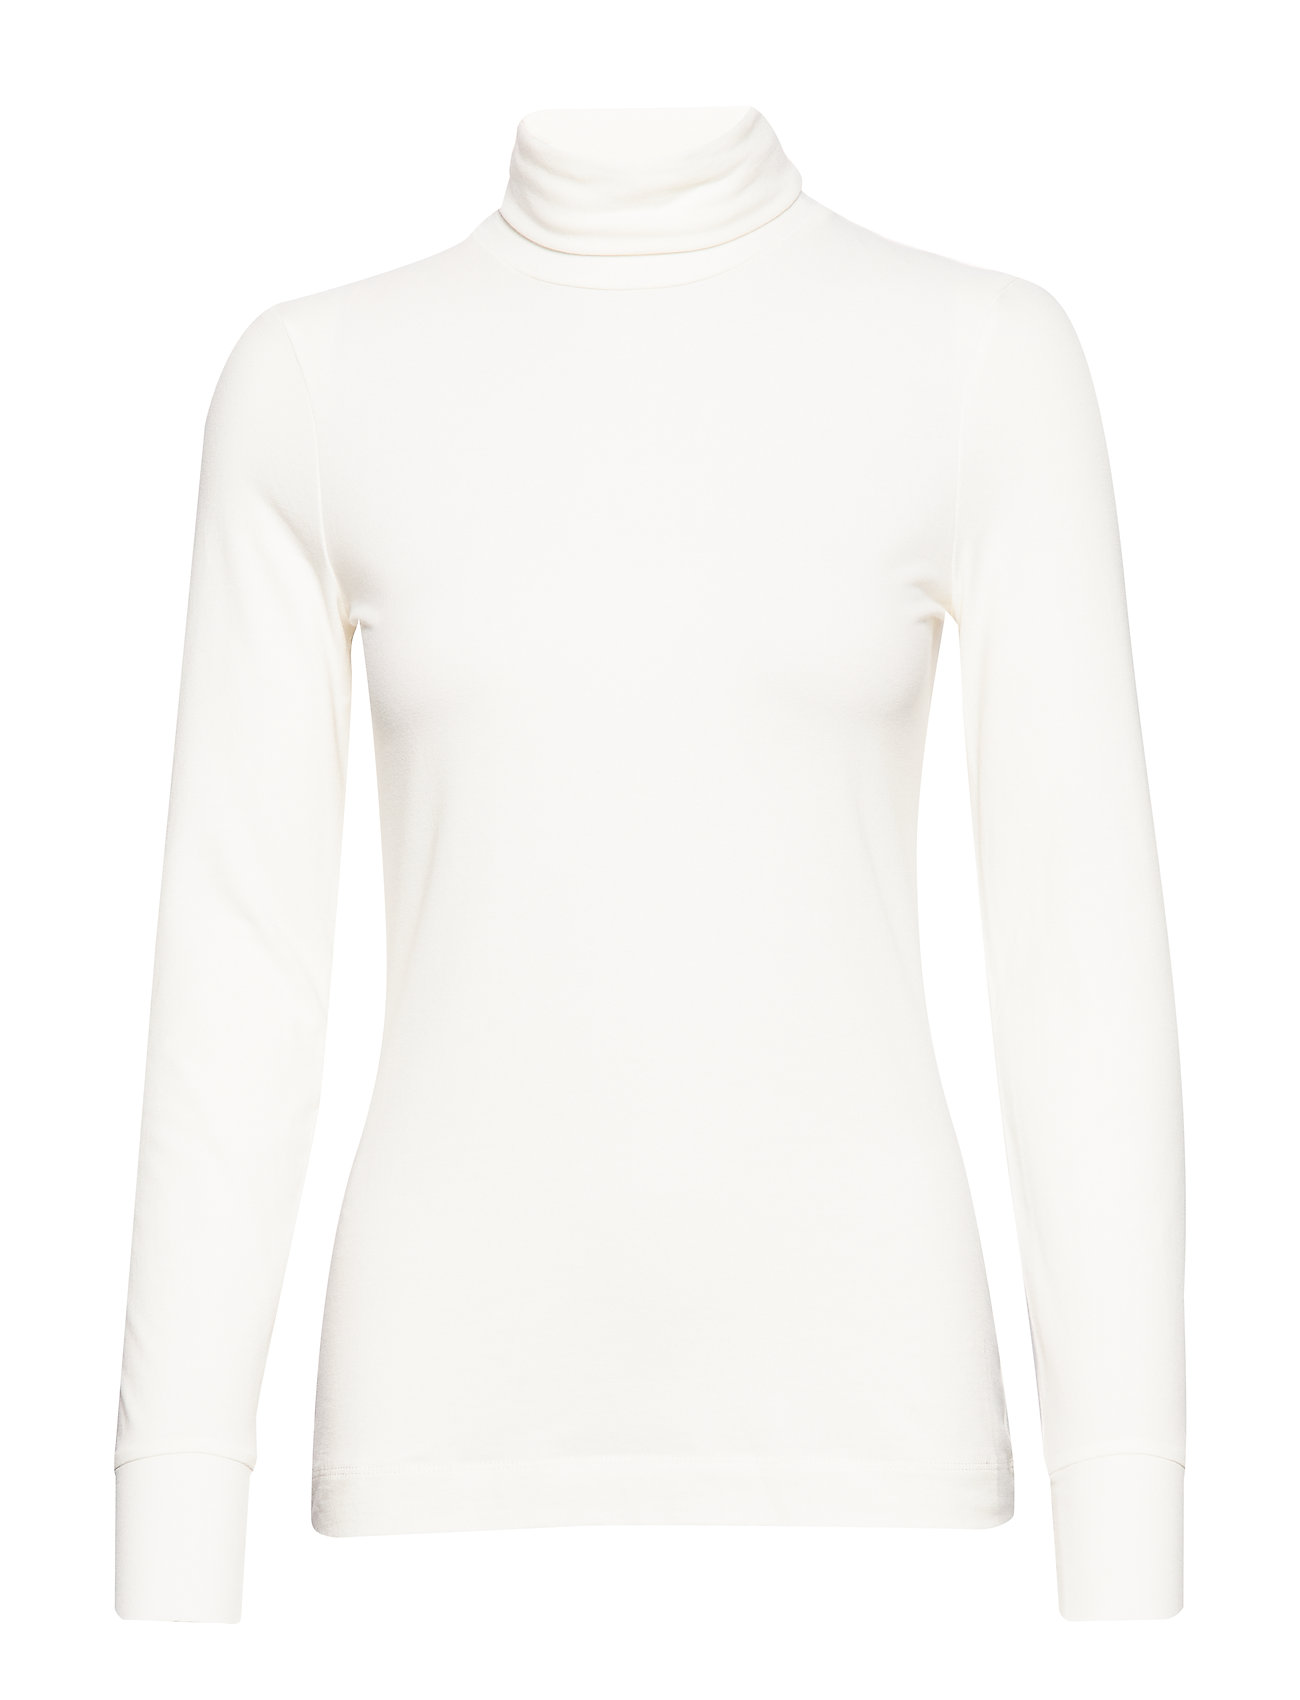 Fondaiw Rollneck Ls Langærmet T-shirt Hvid InWear